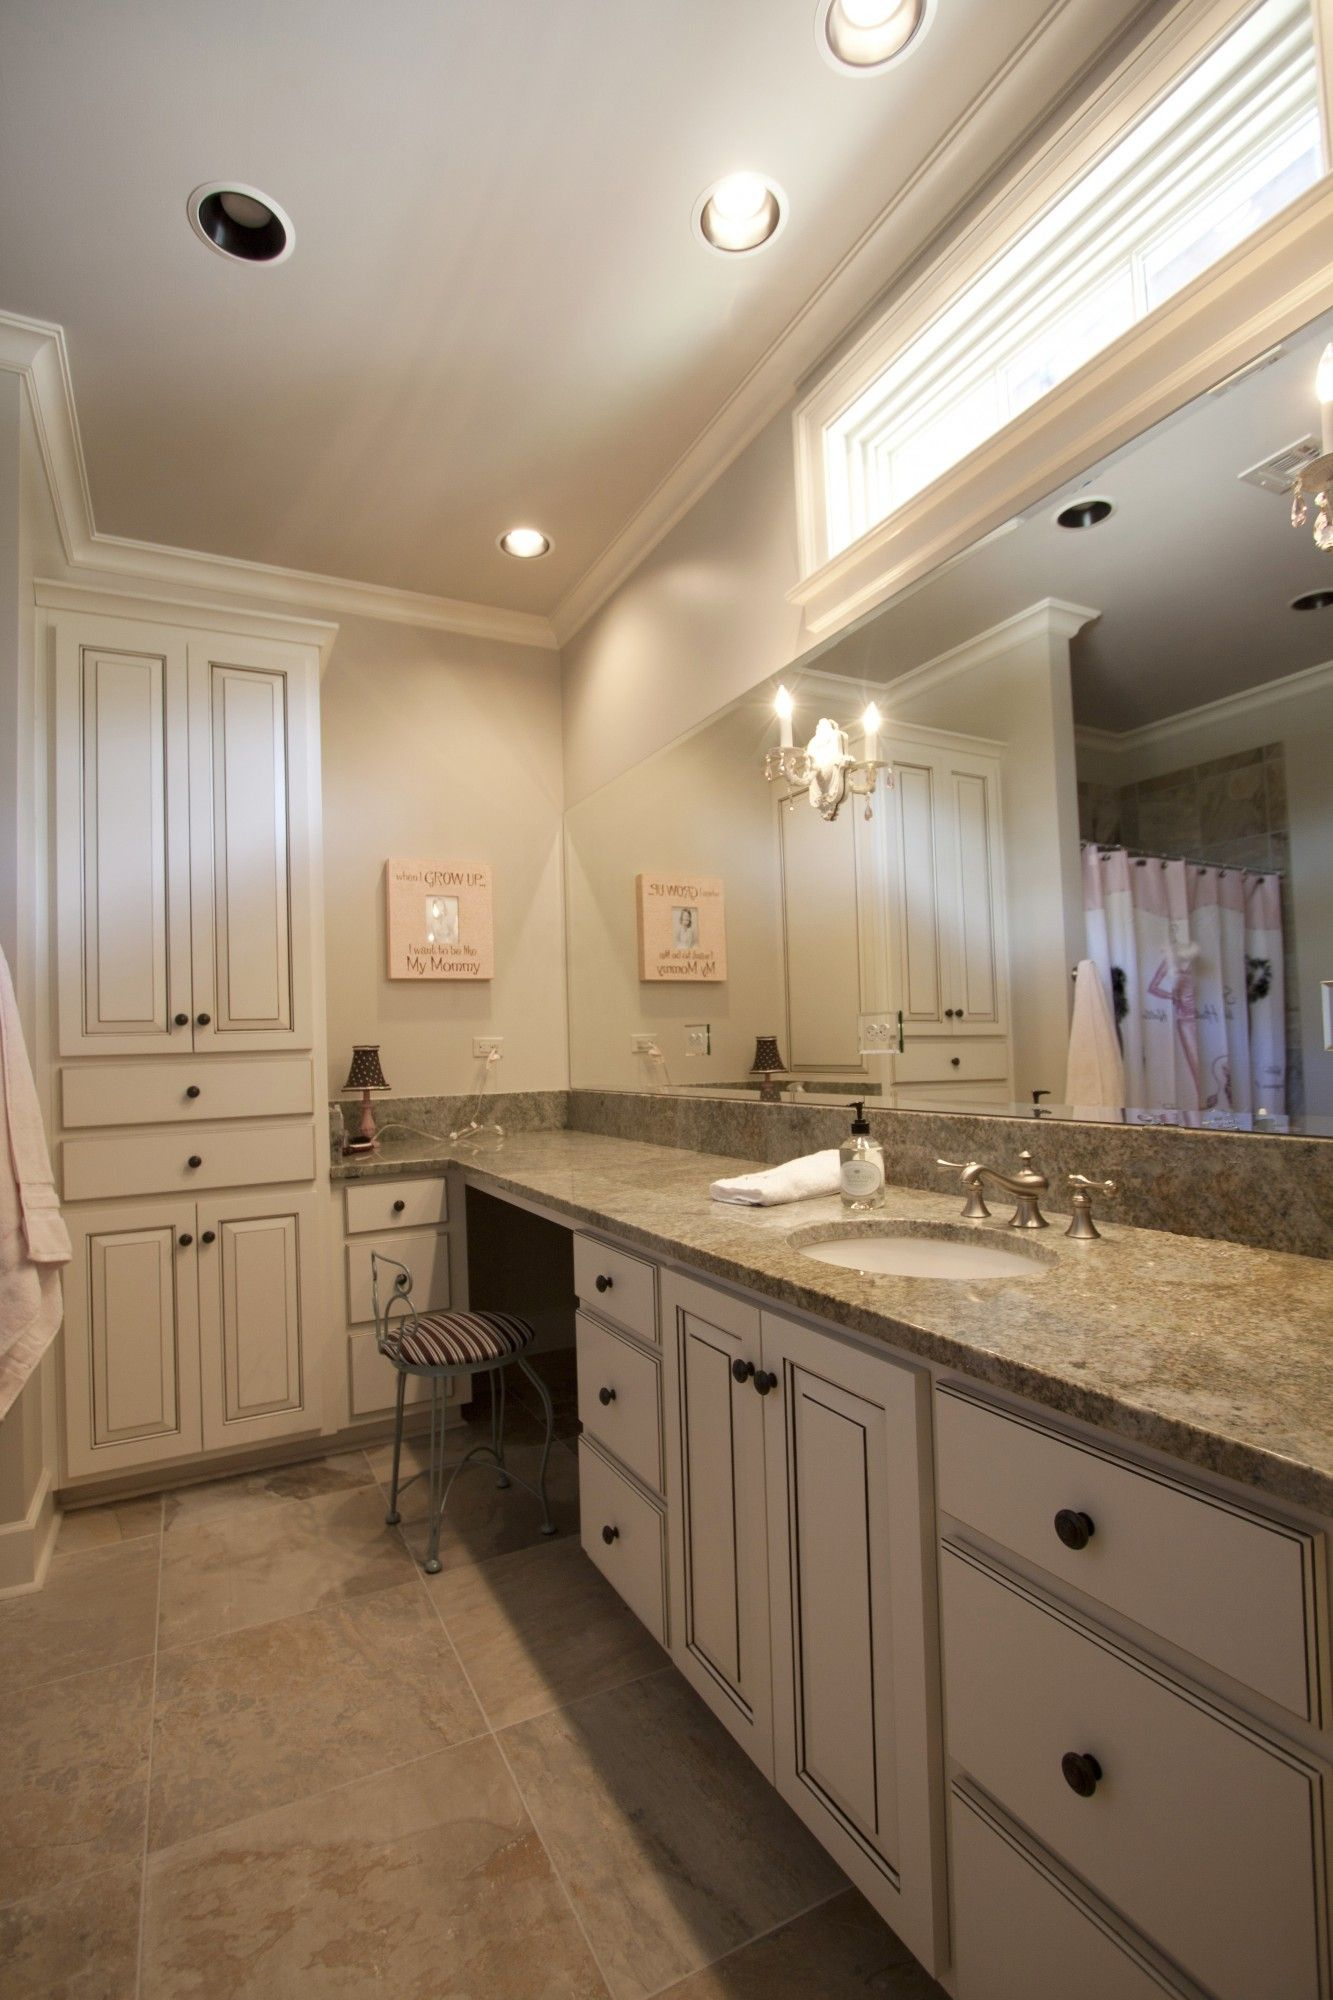 Glazed Bathroom Vanity Cabinets Northshore Millwork LLC - Custom bathroom vanities online for bathroom decor ideas